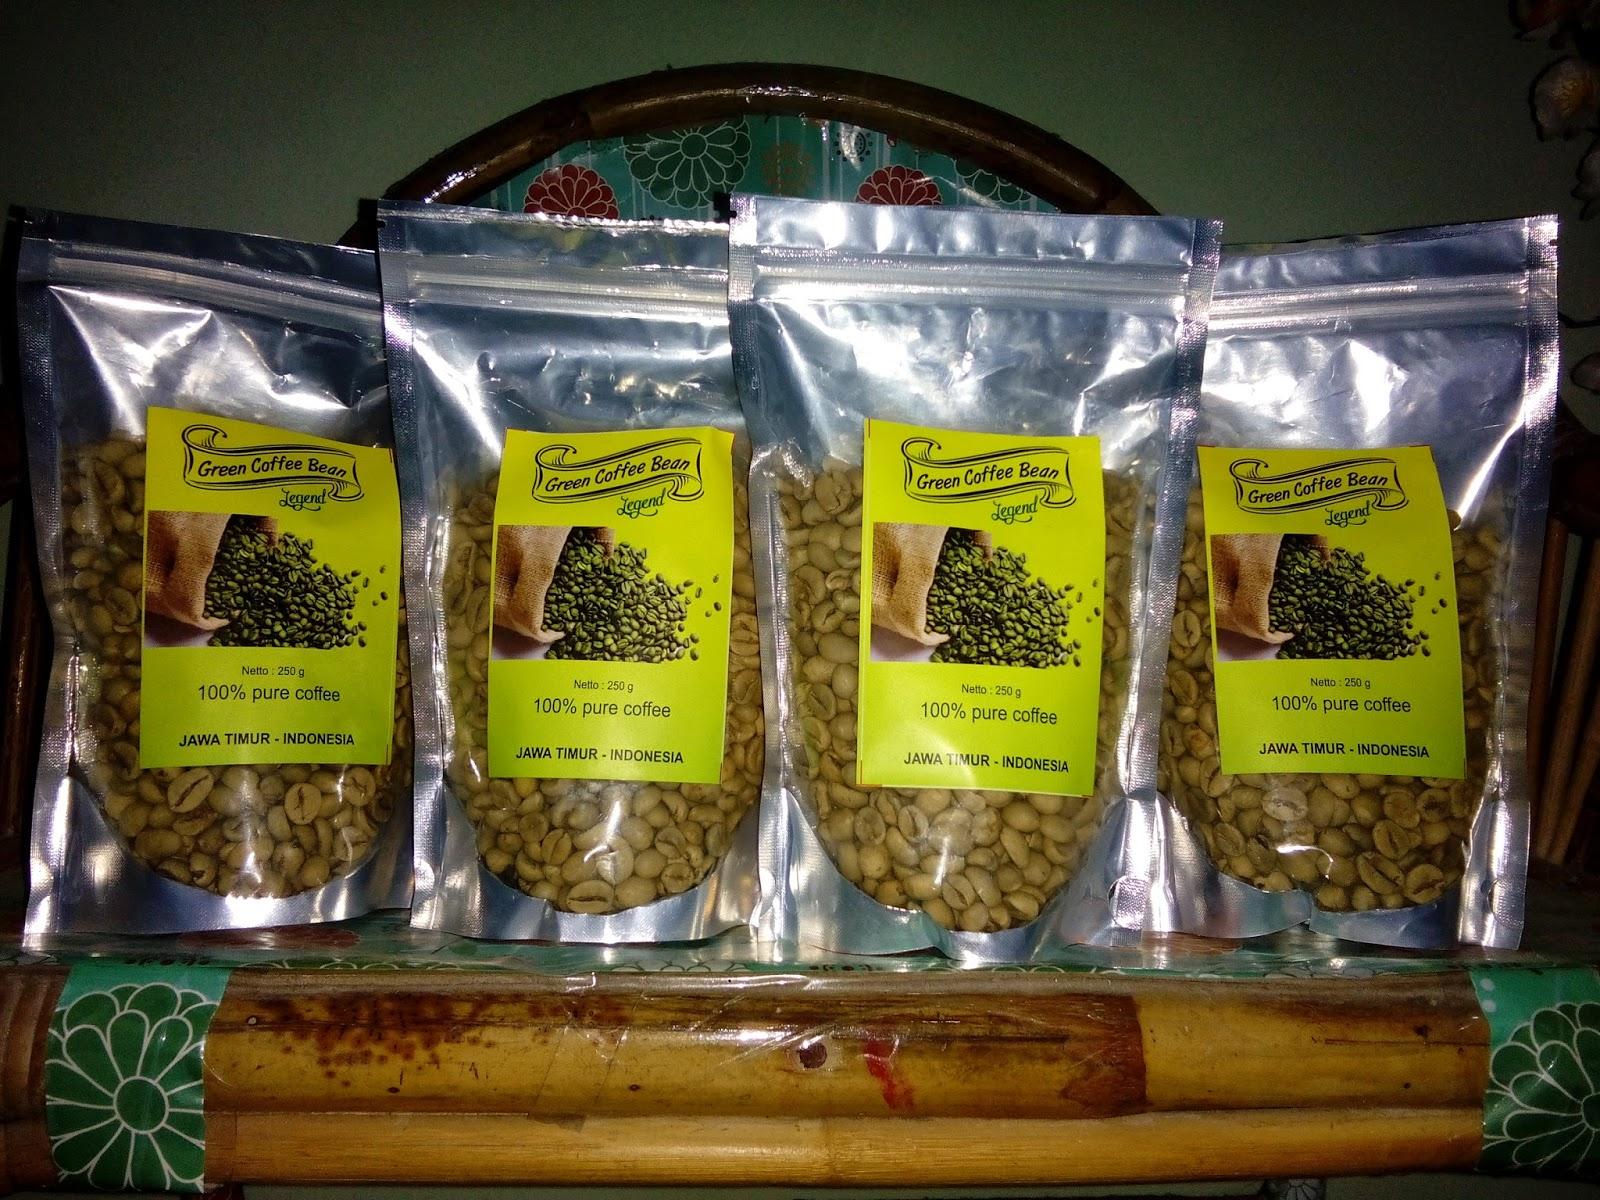 Tag: jual green tea bubuk di surabaya